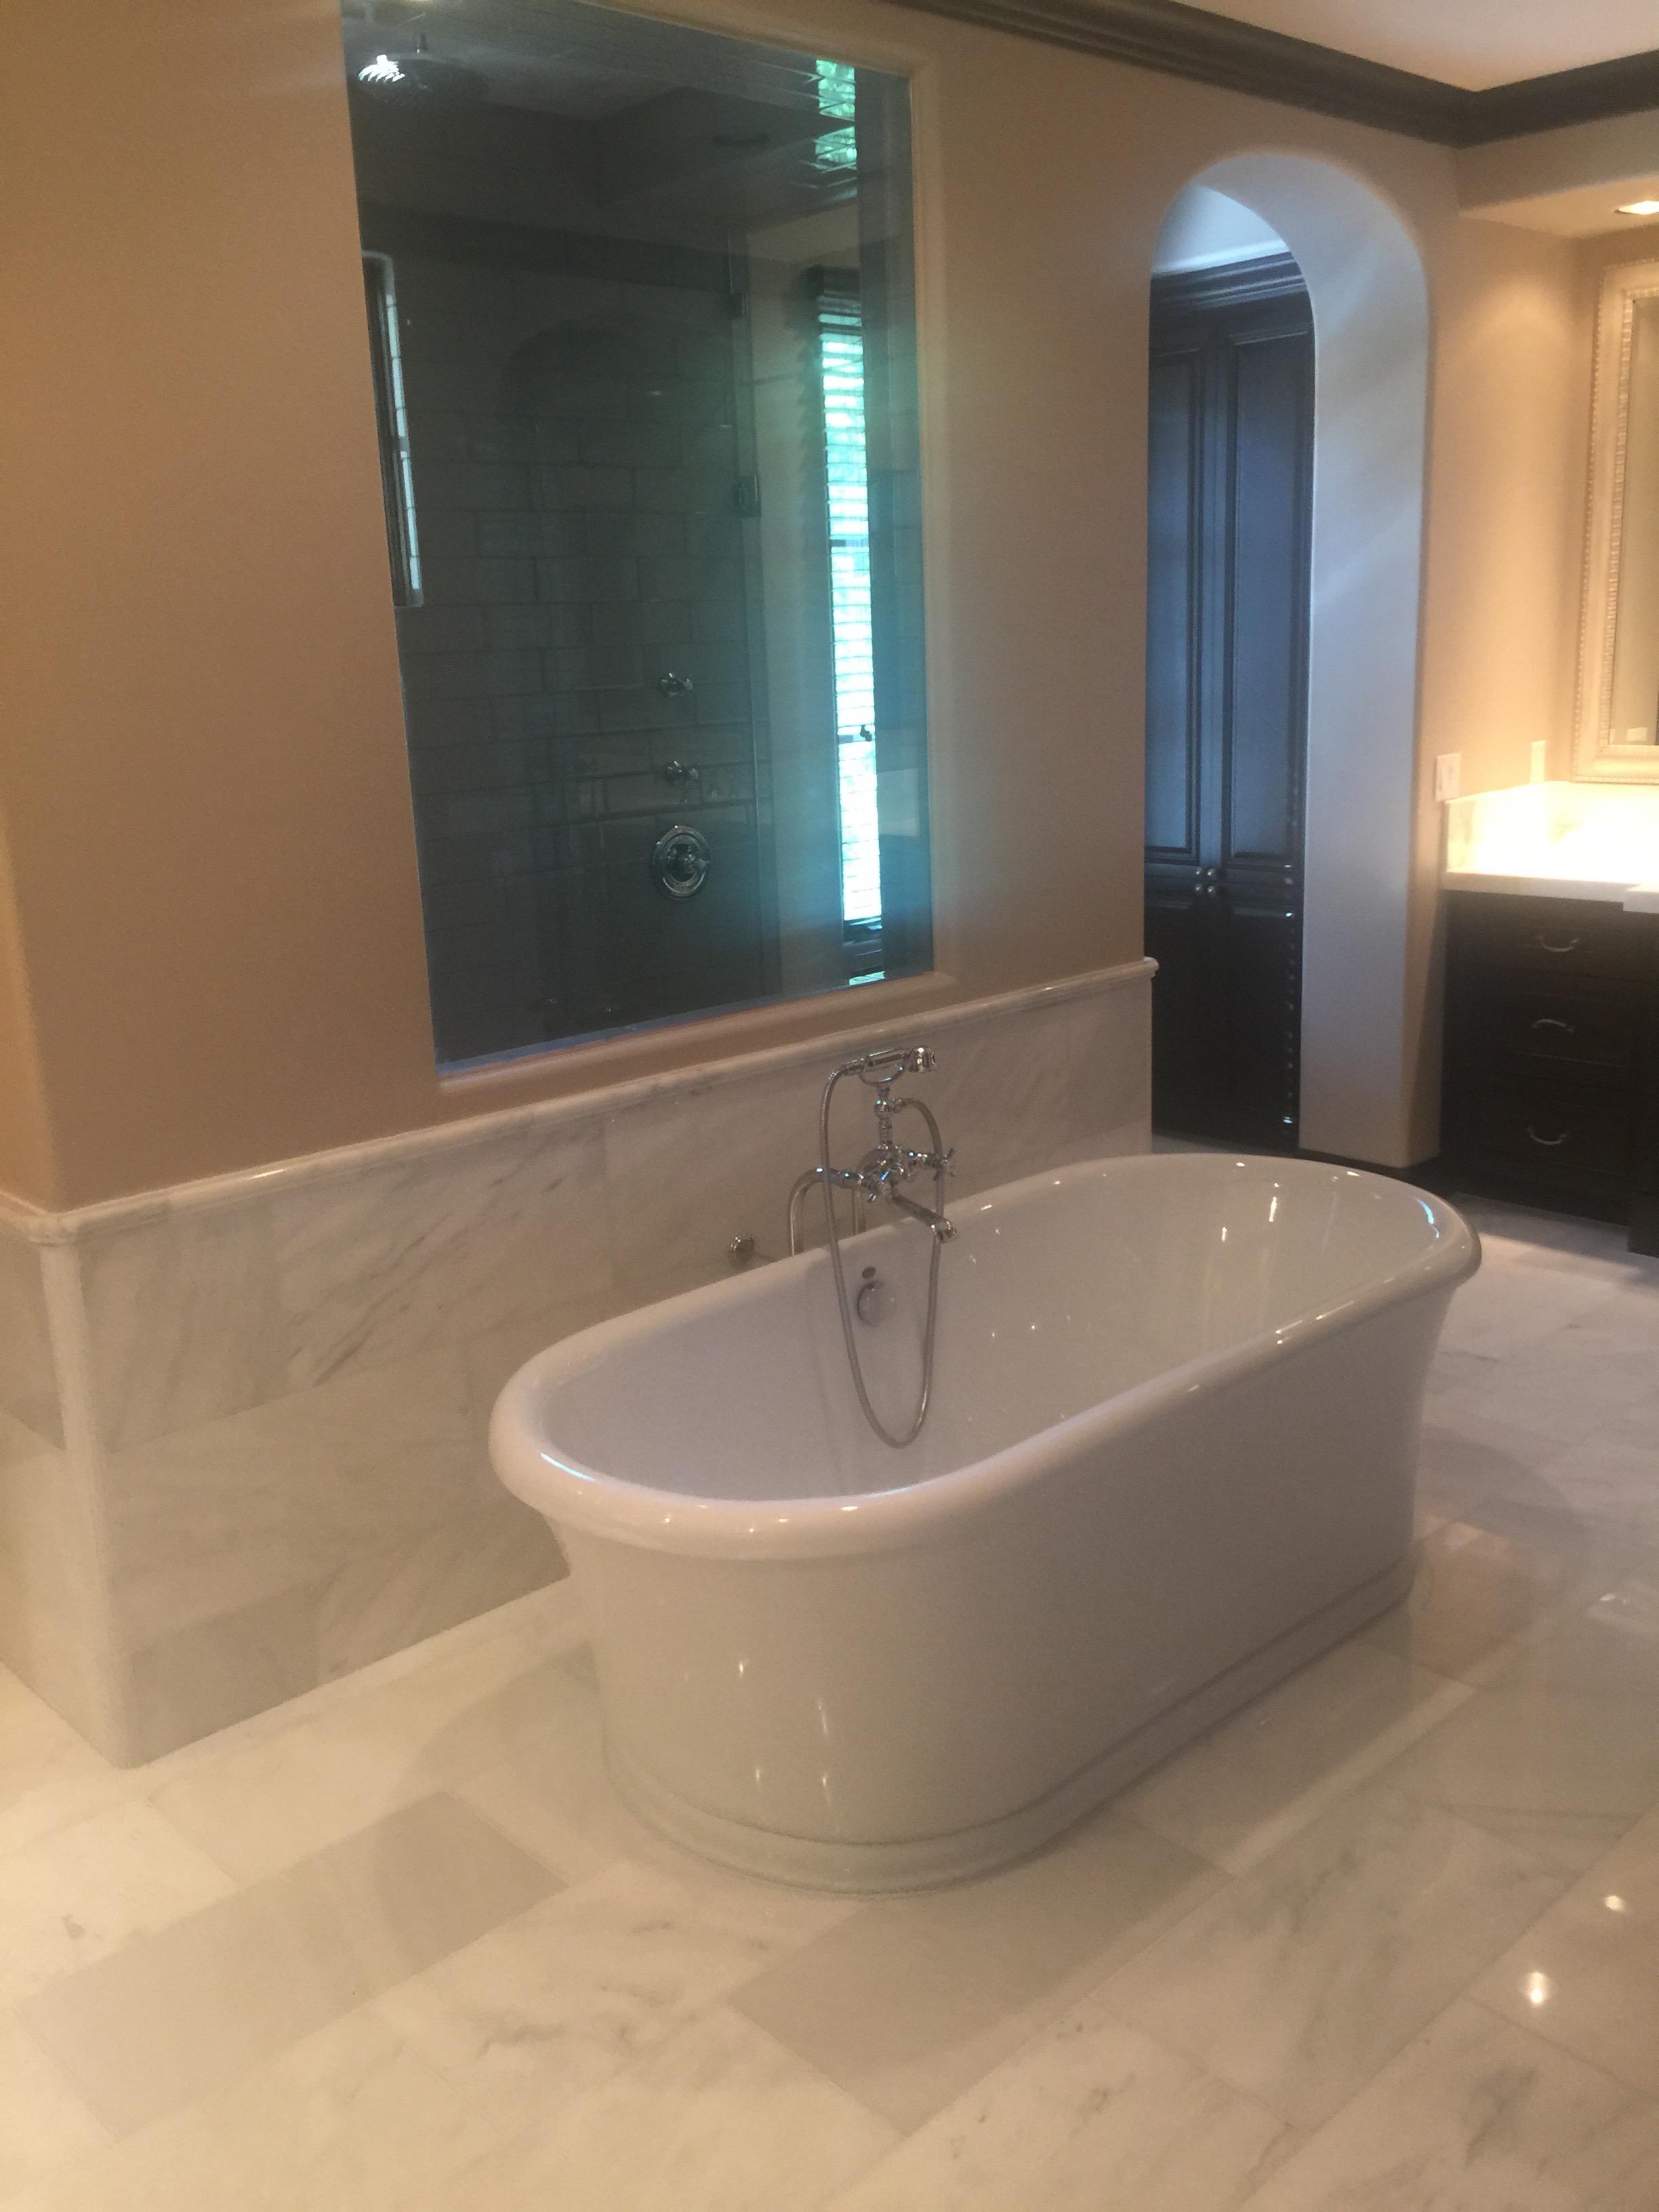 Nottoli After Master Bath Tub_Wainscot.jpg